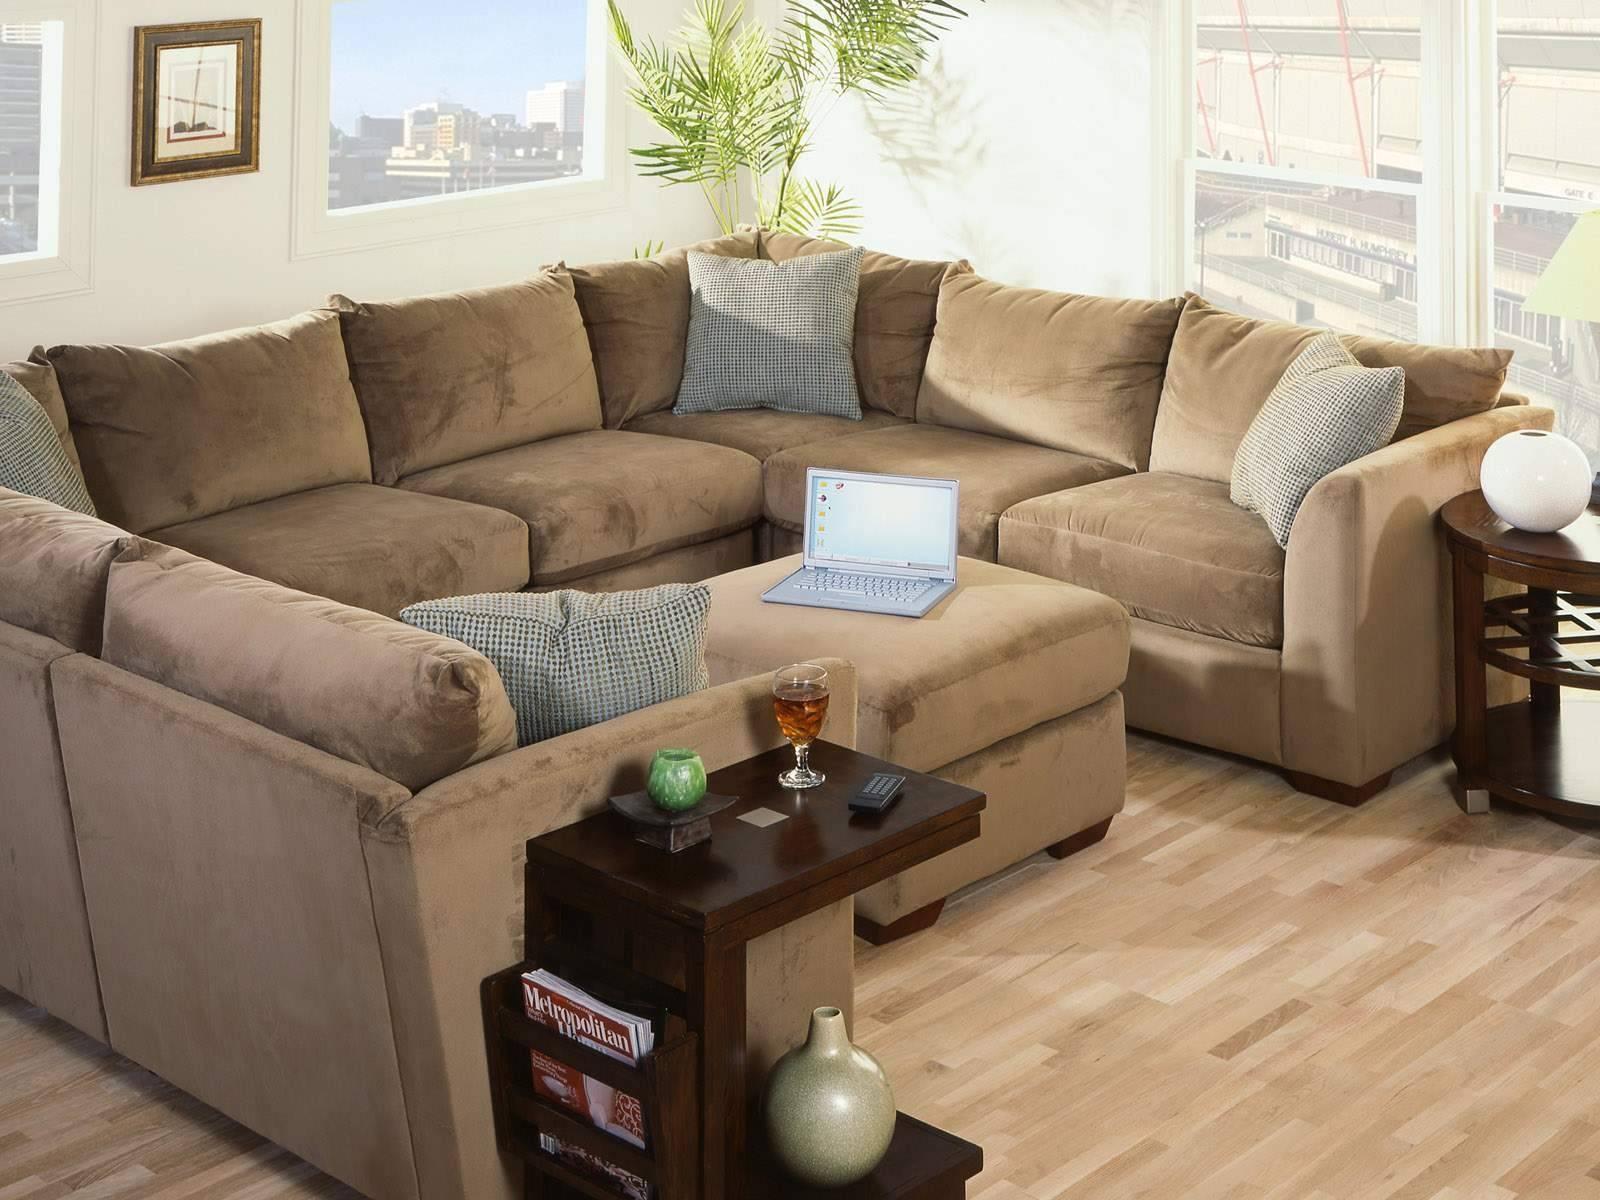 Simmons Sofas At Big Lots | Tehranmix Decoration for Big Lots Sofa (Image 20 of 30)